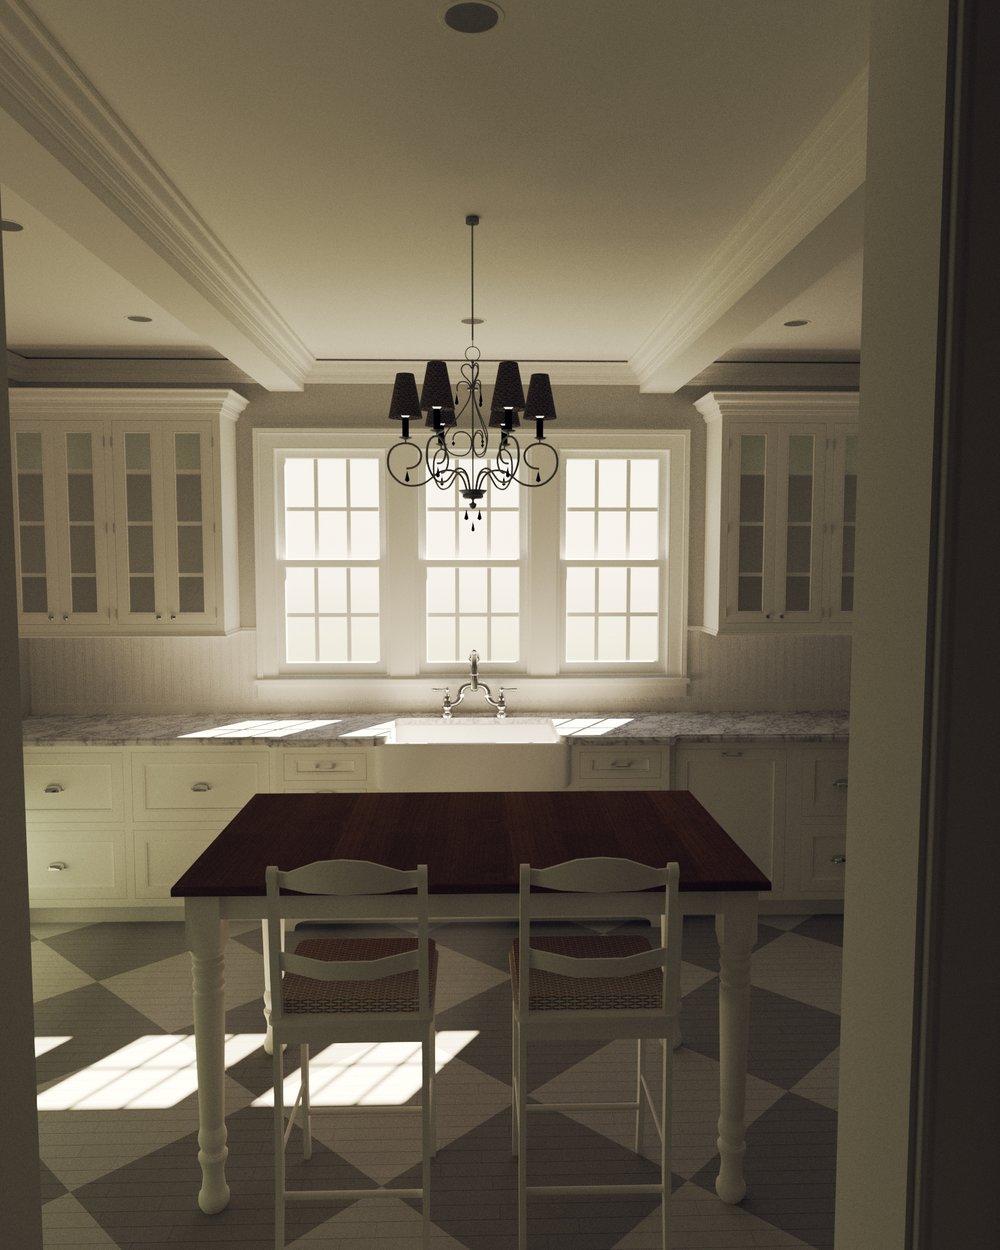 2019-02-01 Blog post- VA kitchen rendering.jpg